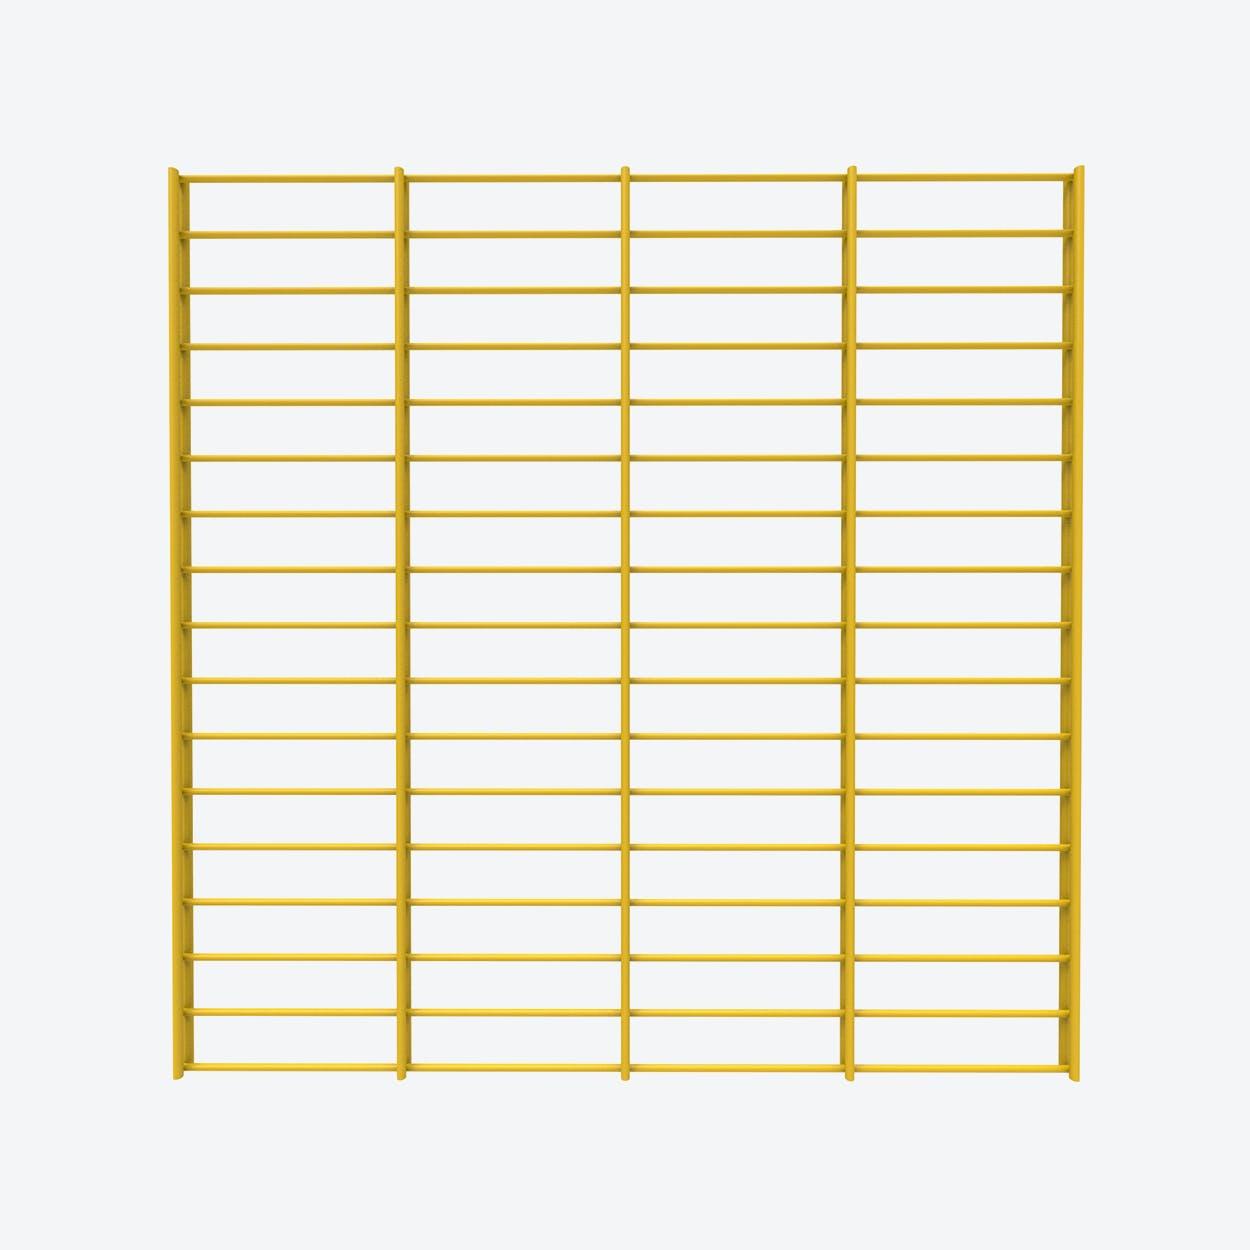 Fency Rack, 80x80 in Yellow